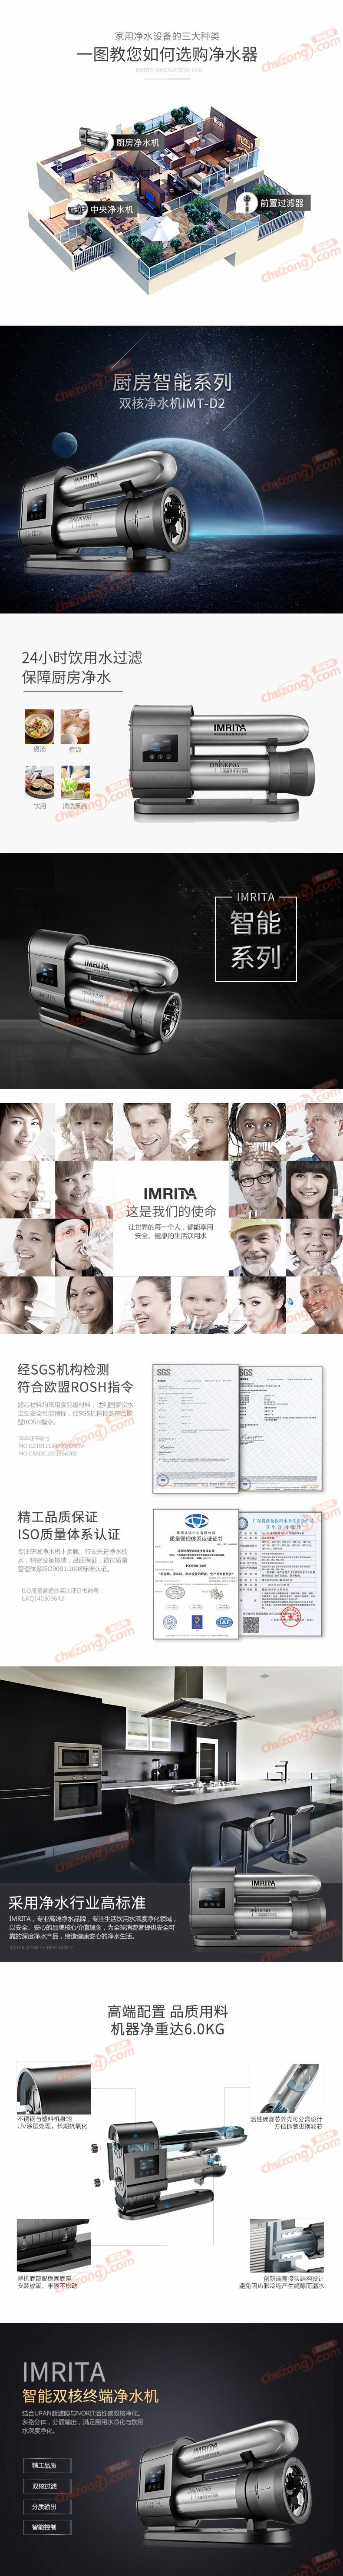 IMRITA/愛瑪特凈水器